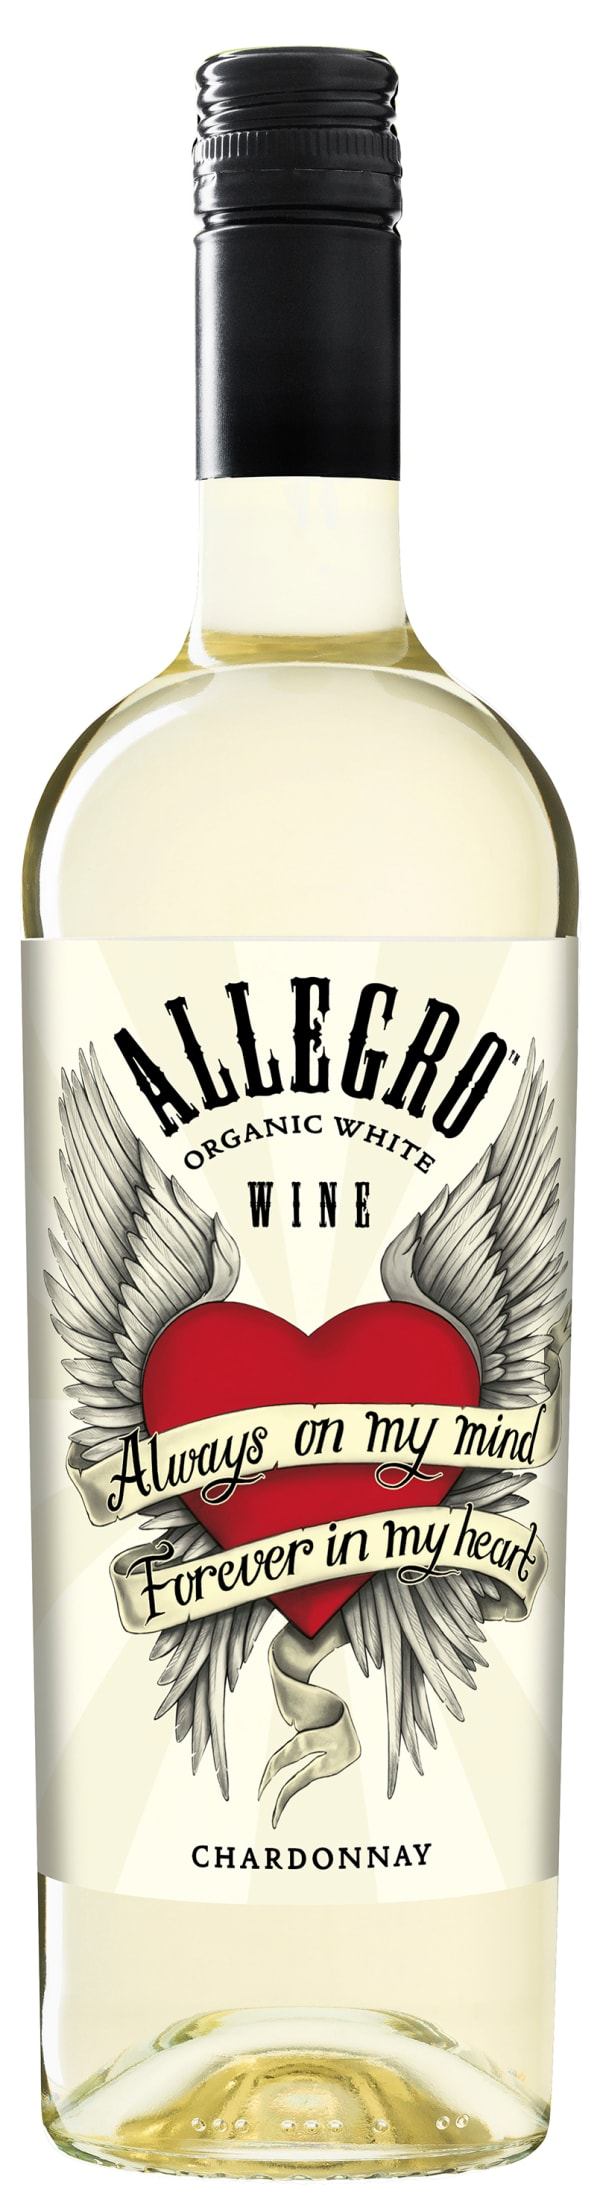 Allegro Organic Chardonnay 2017